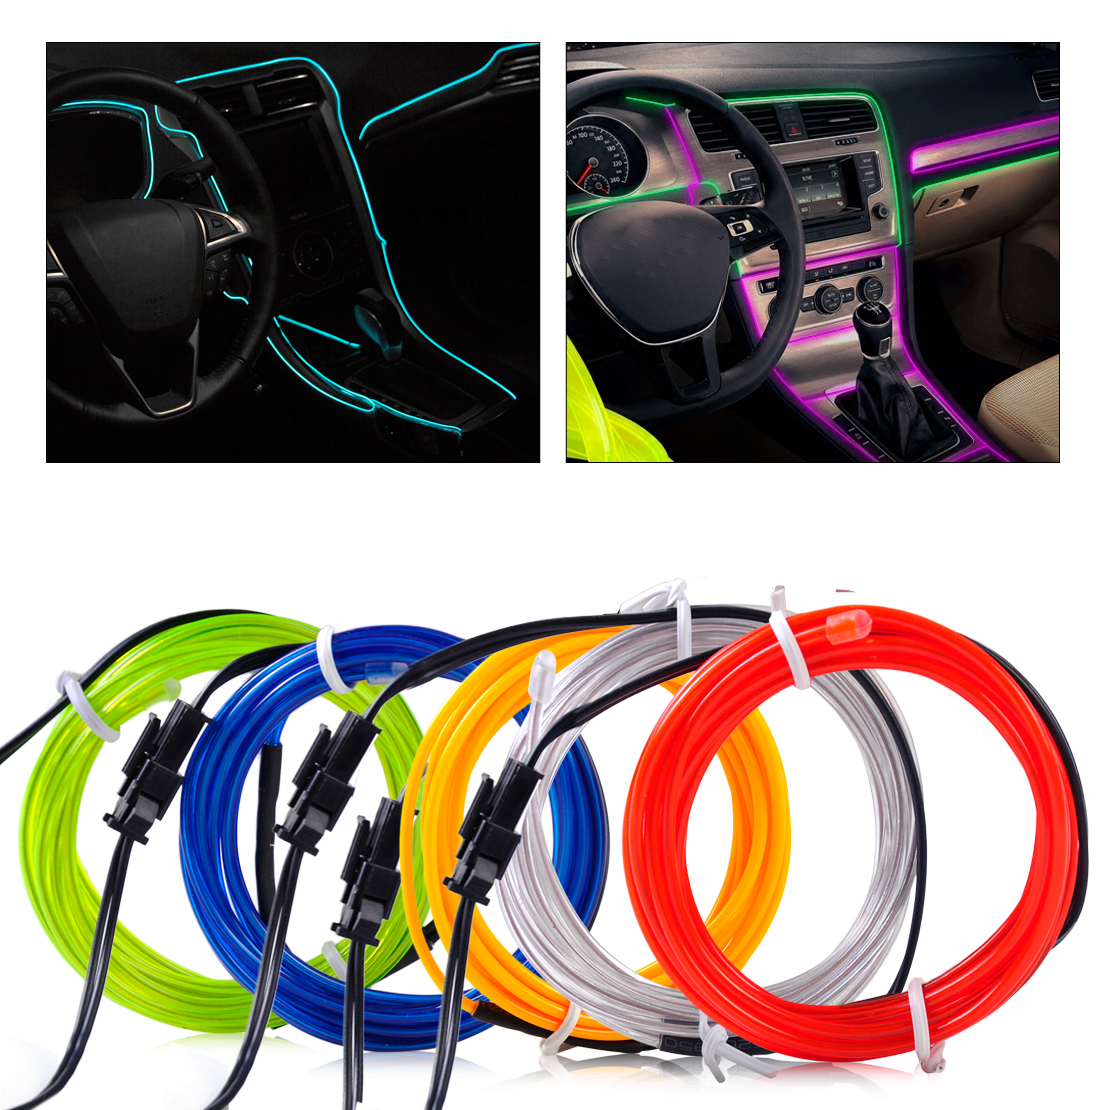 DWCX 3mm 2m EL-Wire Flexible Stylings Car Interior Decor Fluorescent Neon Light Strip Cold light Tape 12V DC Cigarette Lighter